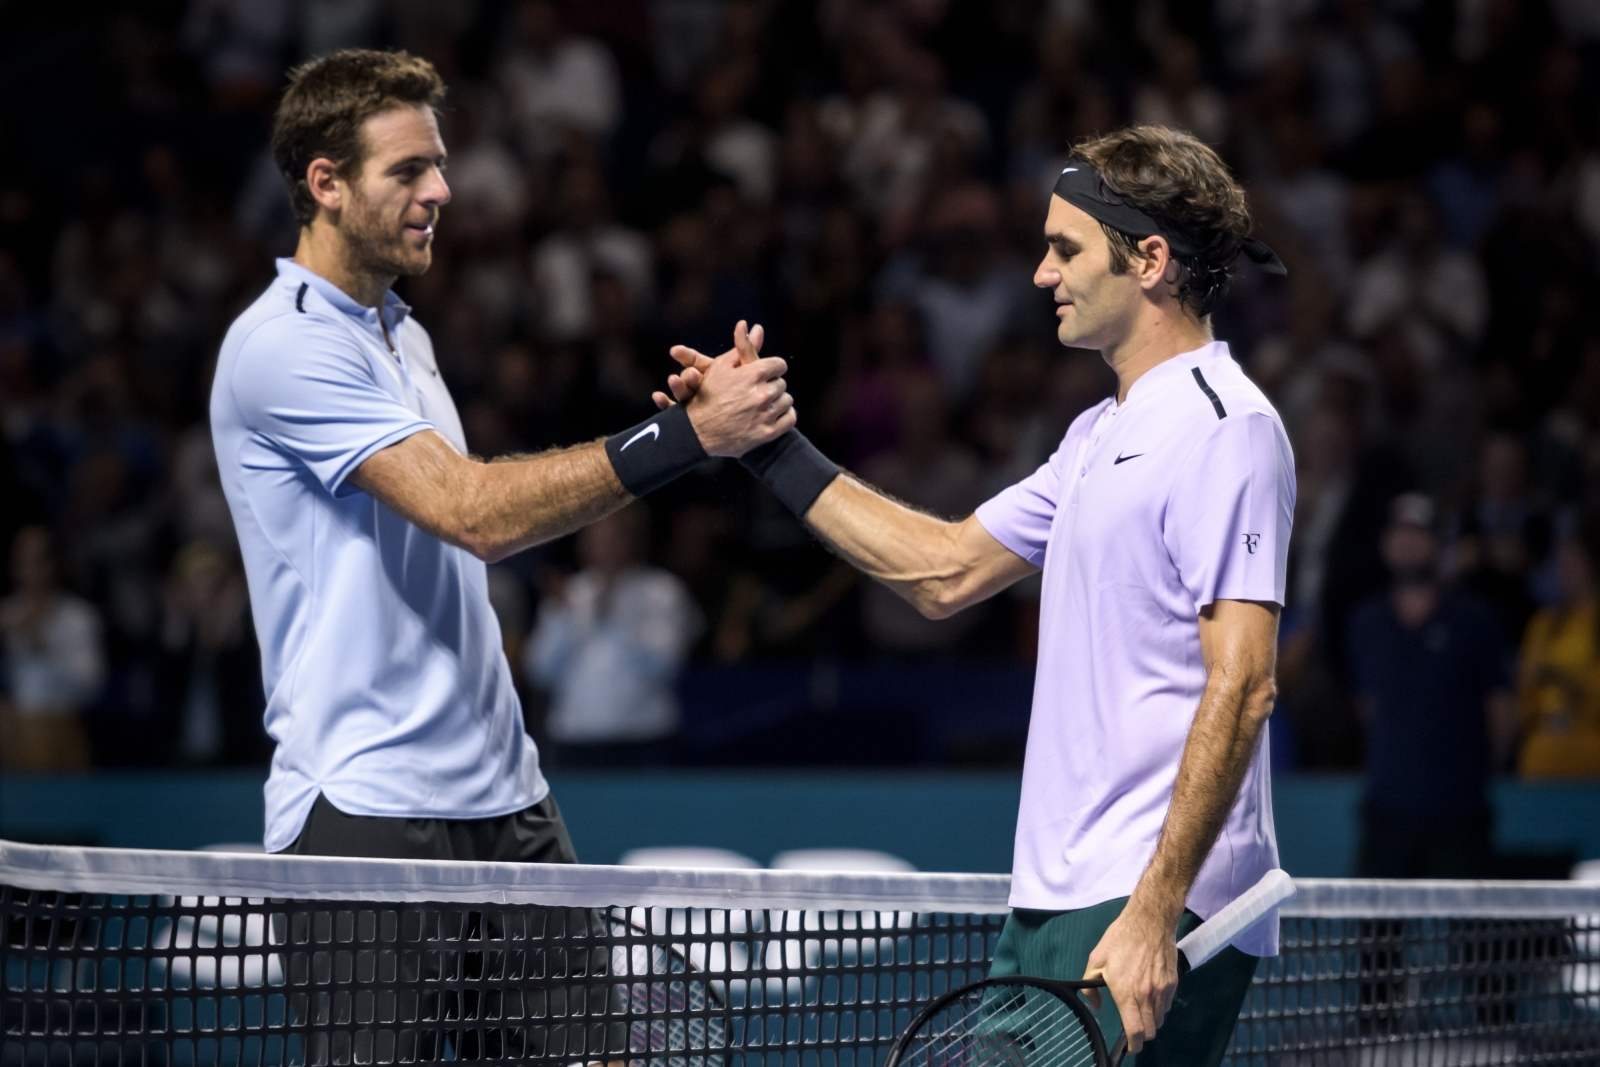 Juan Martin del Potro and Roger Federer